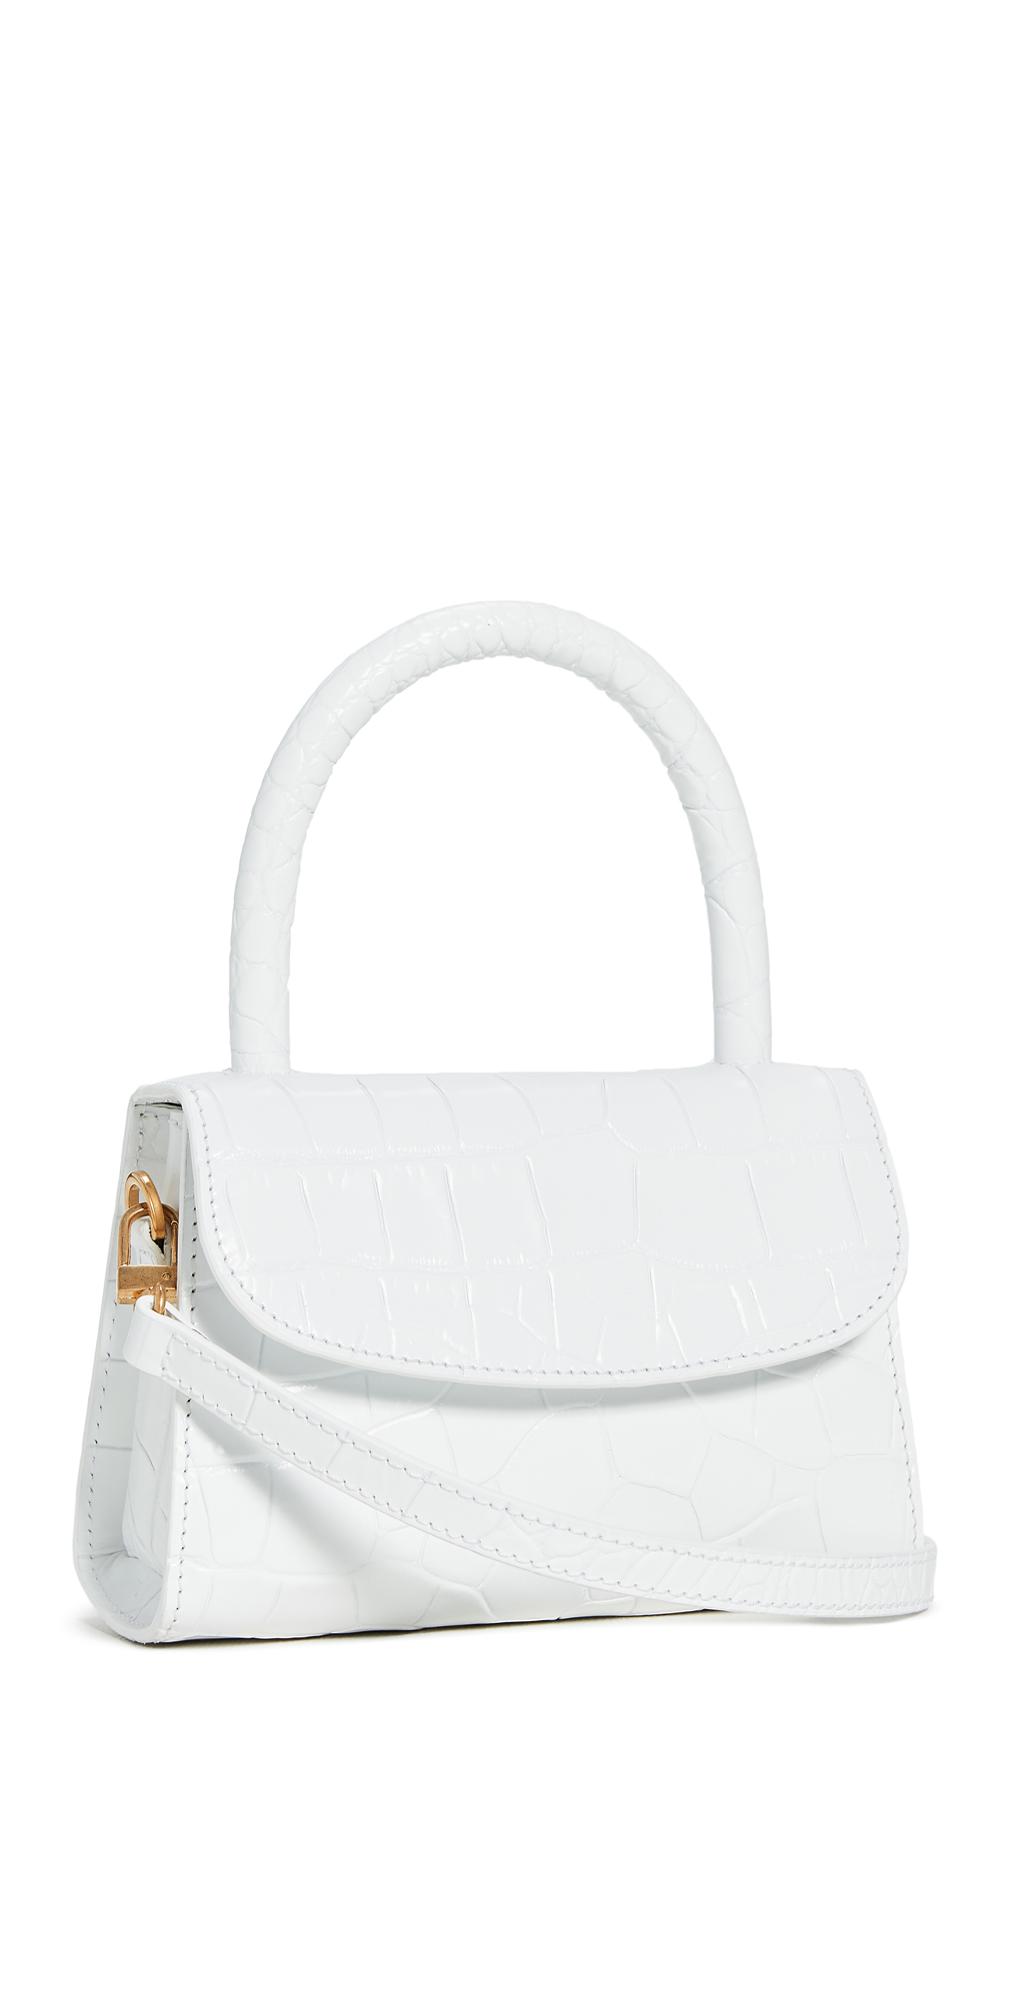 BY FAR Mini Croco Embossed Top Handle Bag